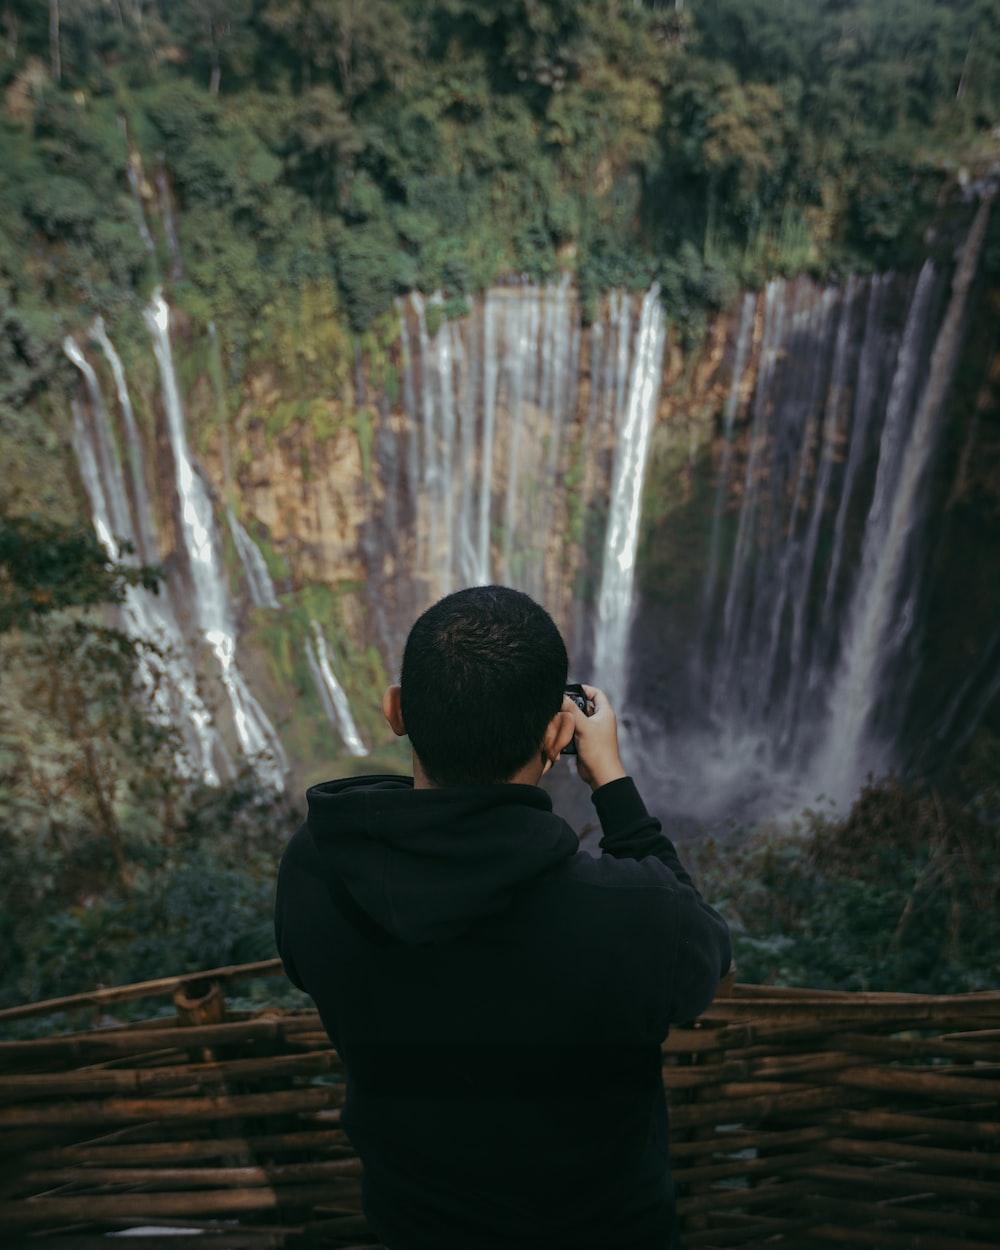 an holding camera capturing falls